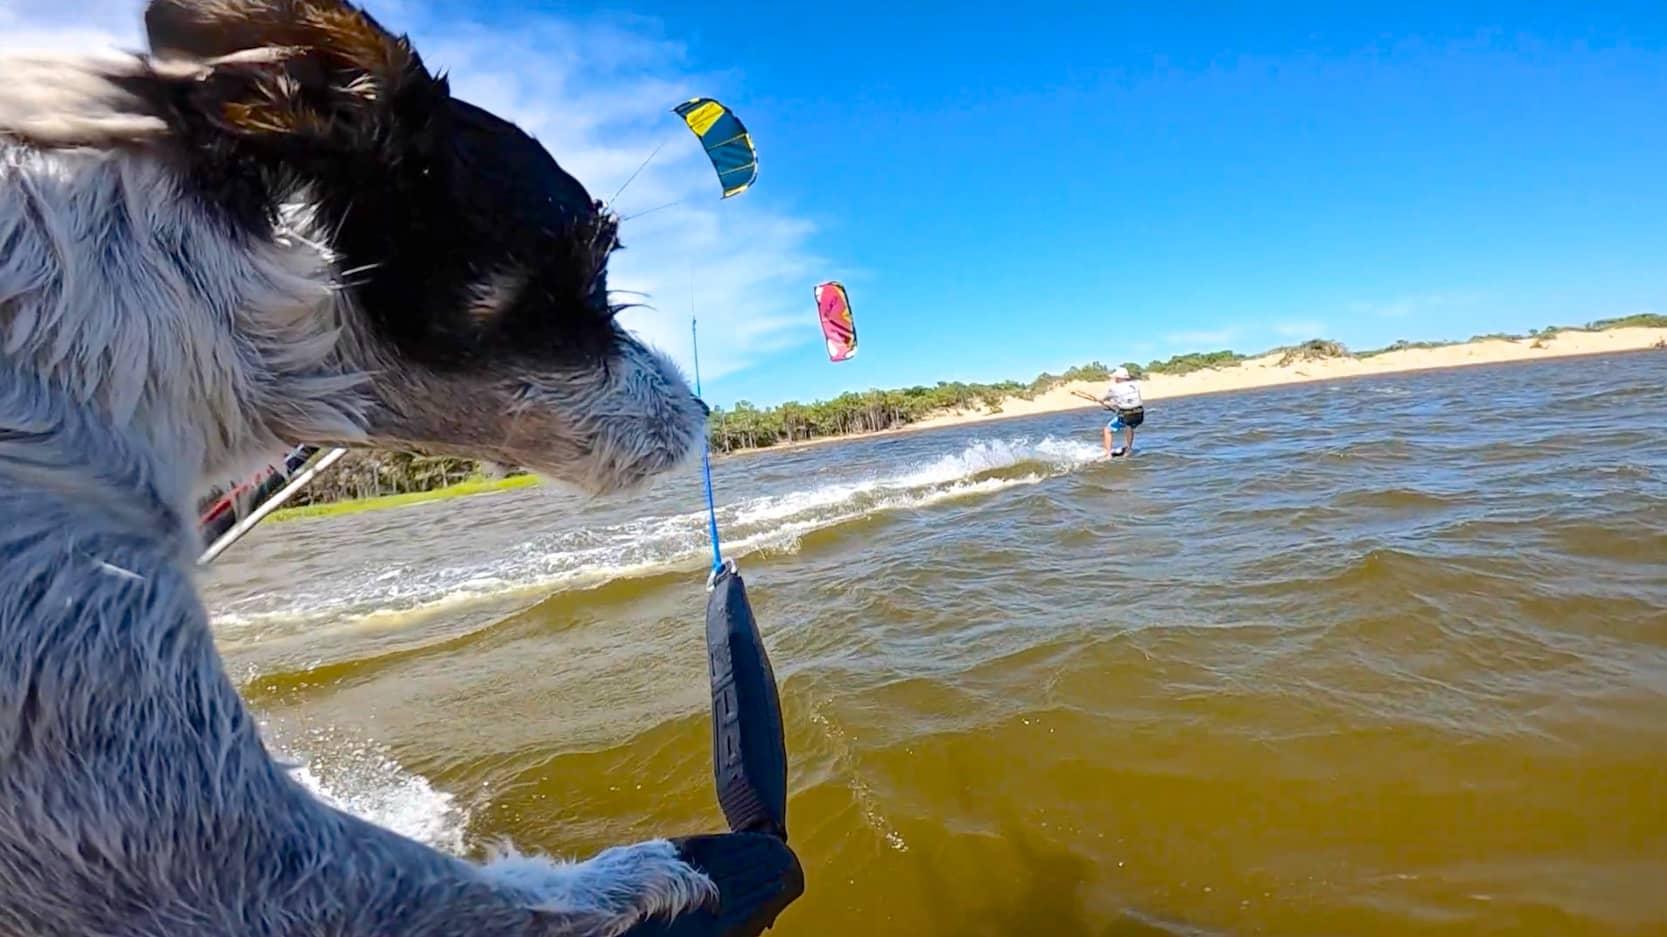 Crazy dog kiter - with Epic Kites Kiteboarding